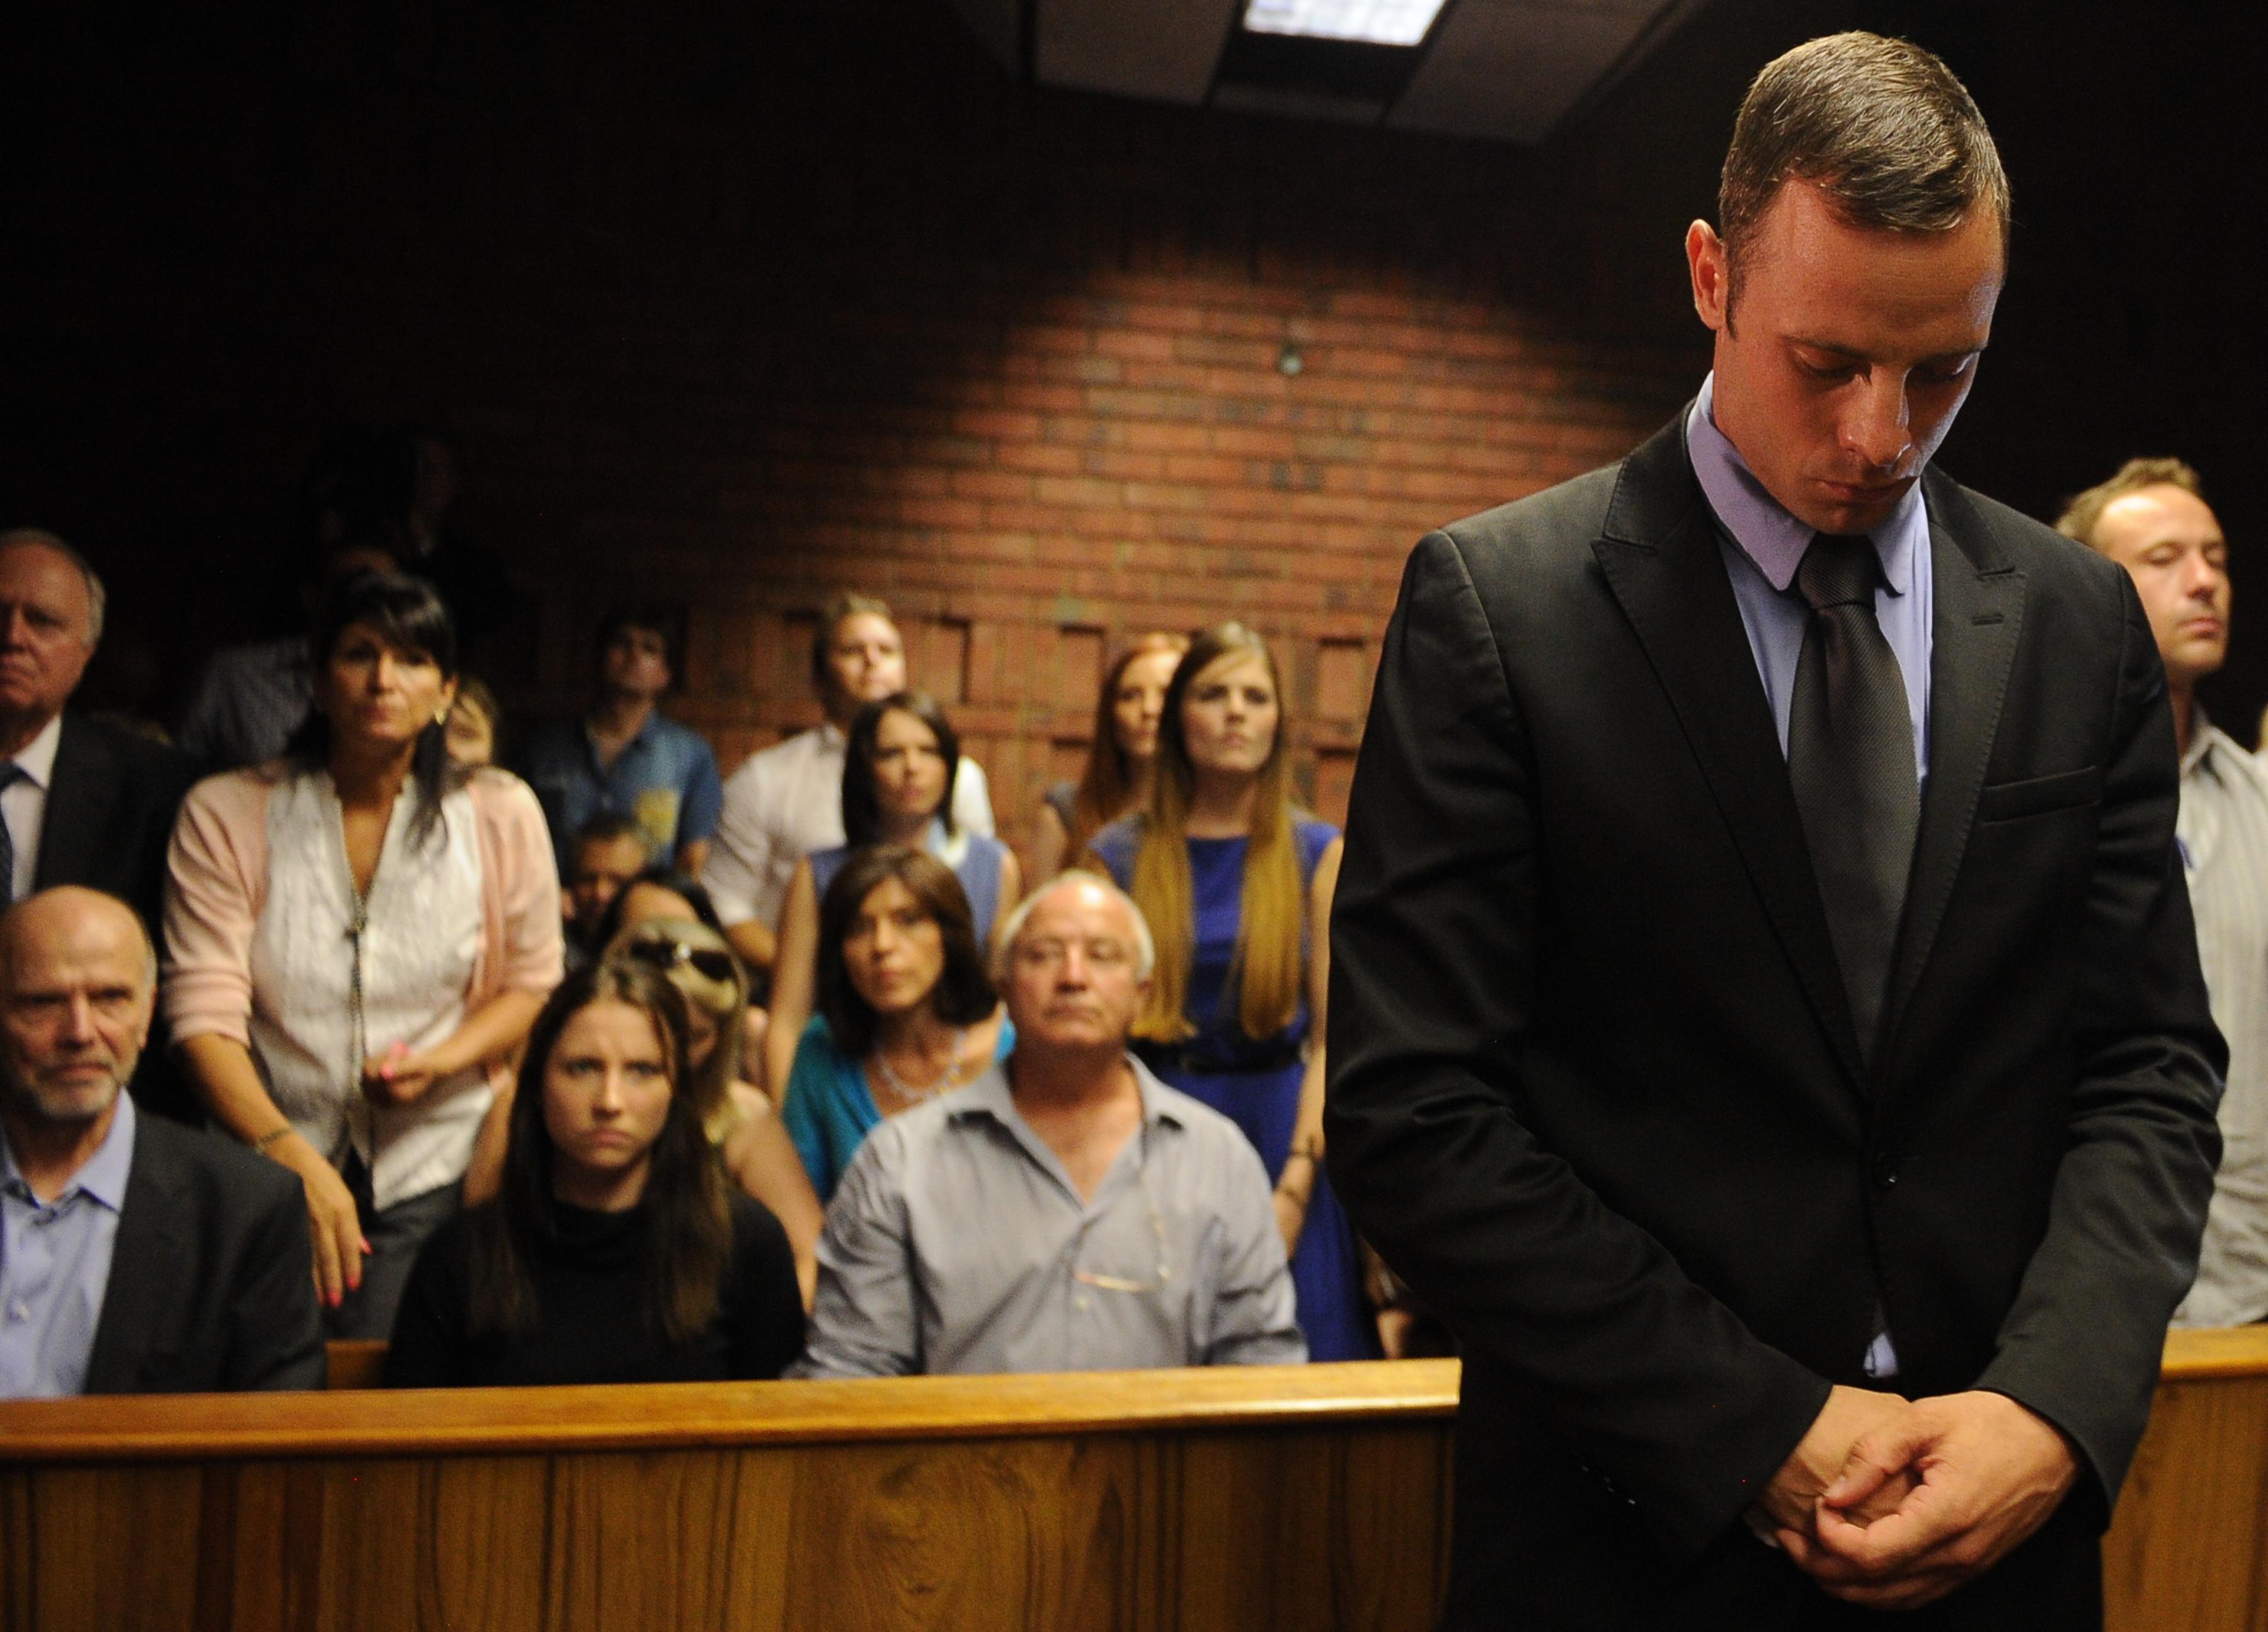 Oscar Pistorius-Fall: So würde OJ Simpsons-Anwalt einen Freispruch erwirken